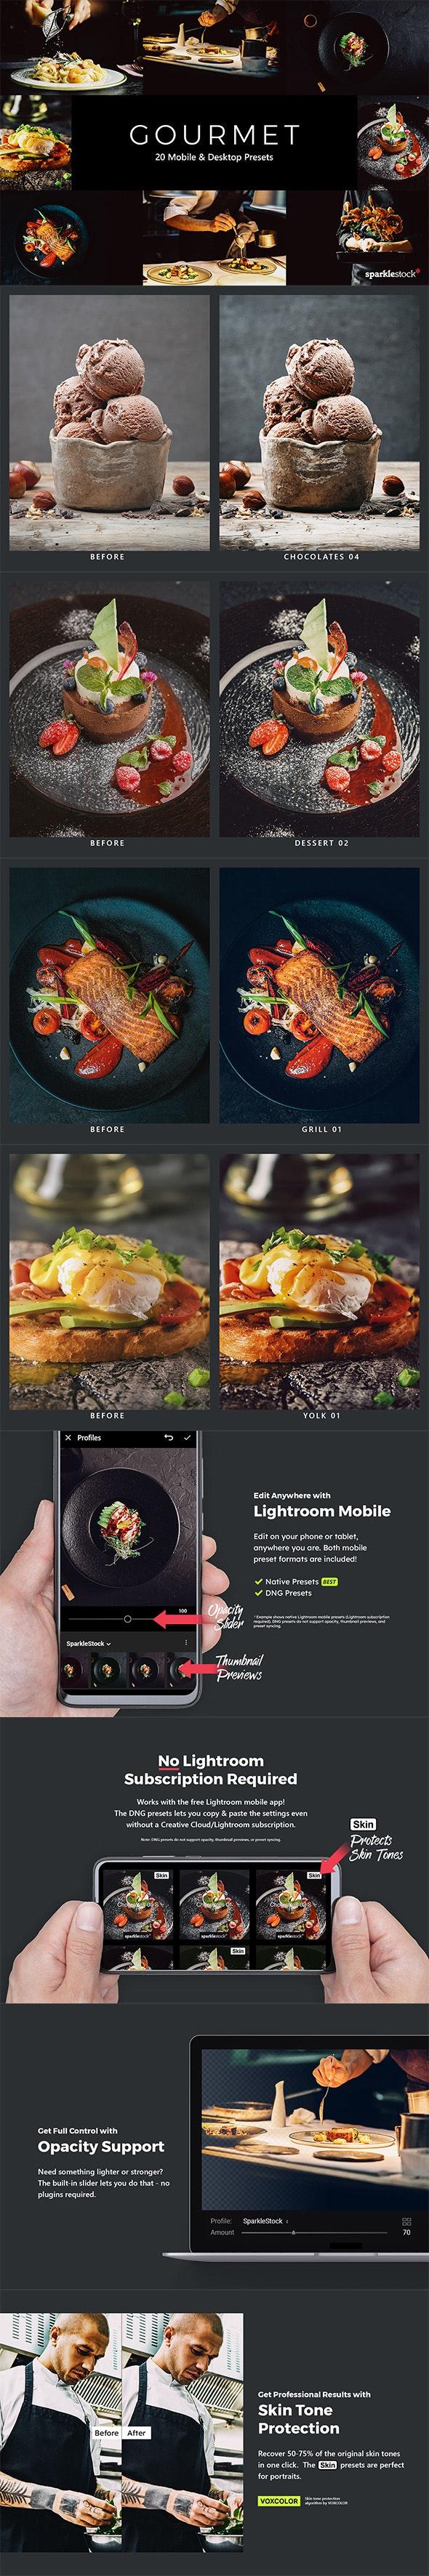 20 Gourmet Lightroom Presets & LUTs - Lightroom Presets Add-ons